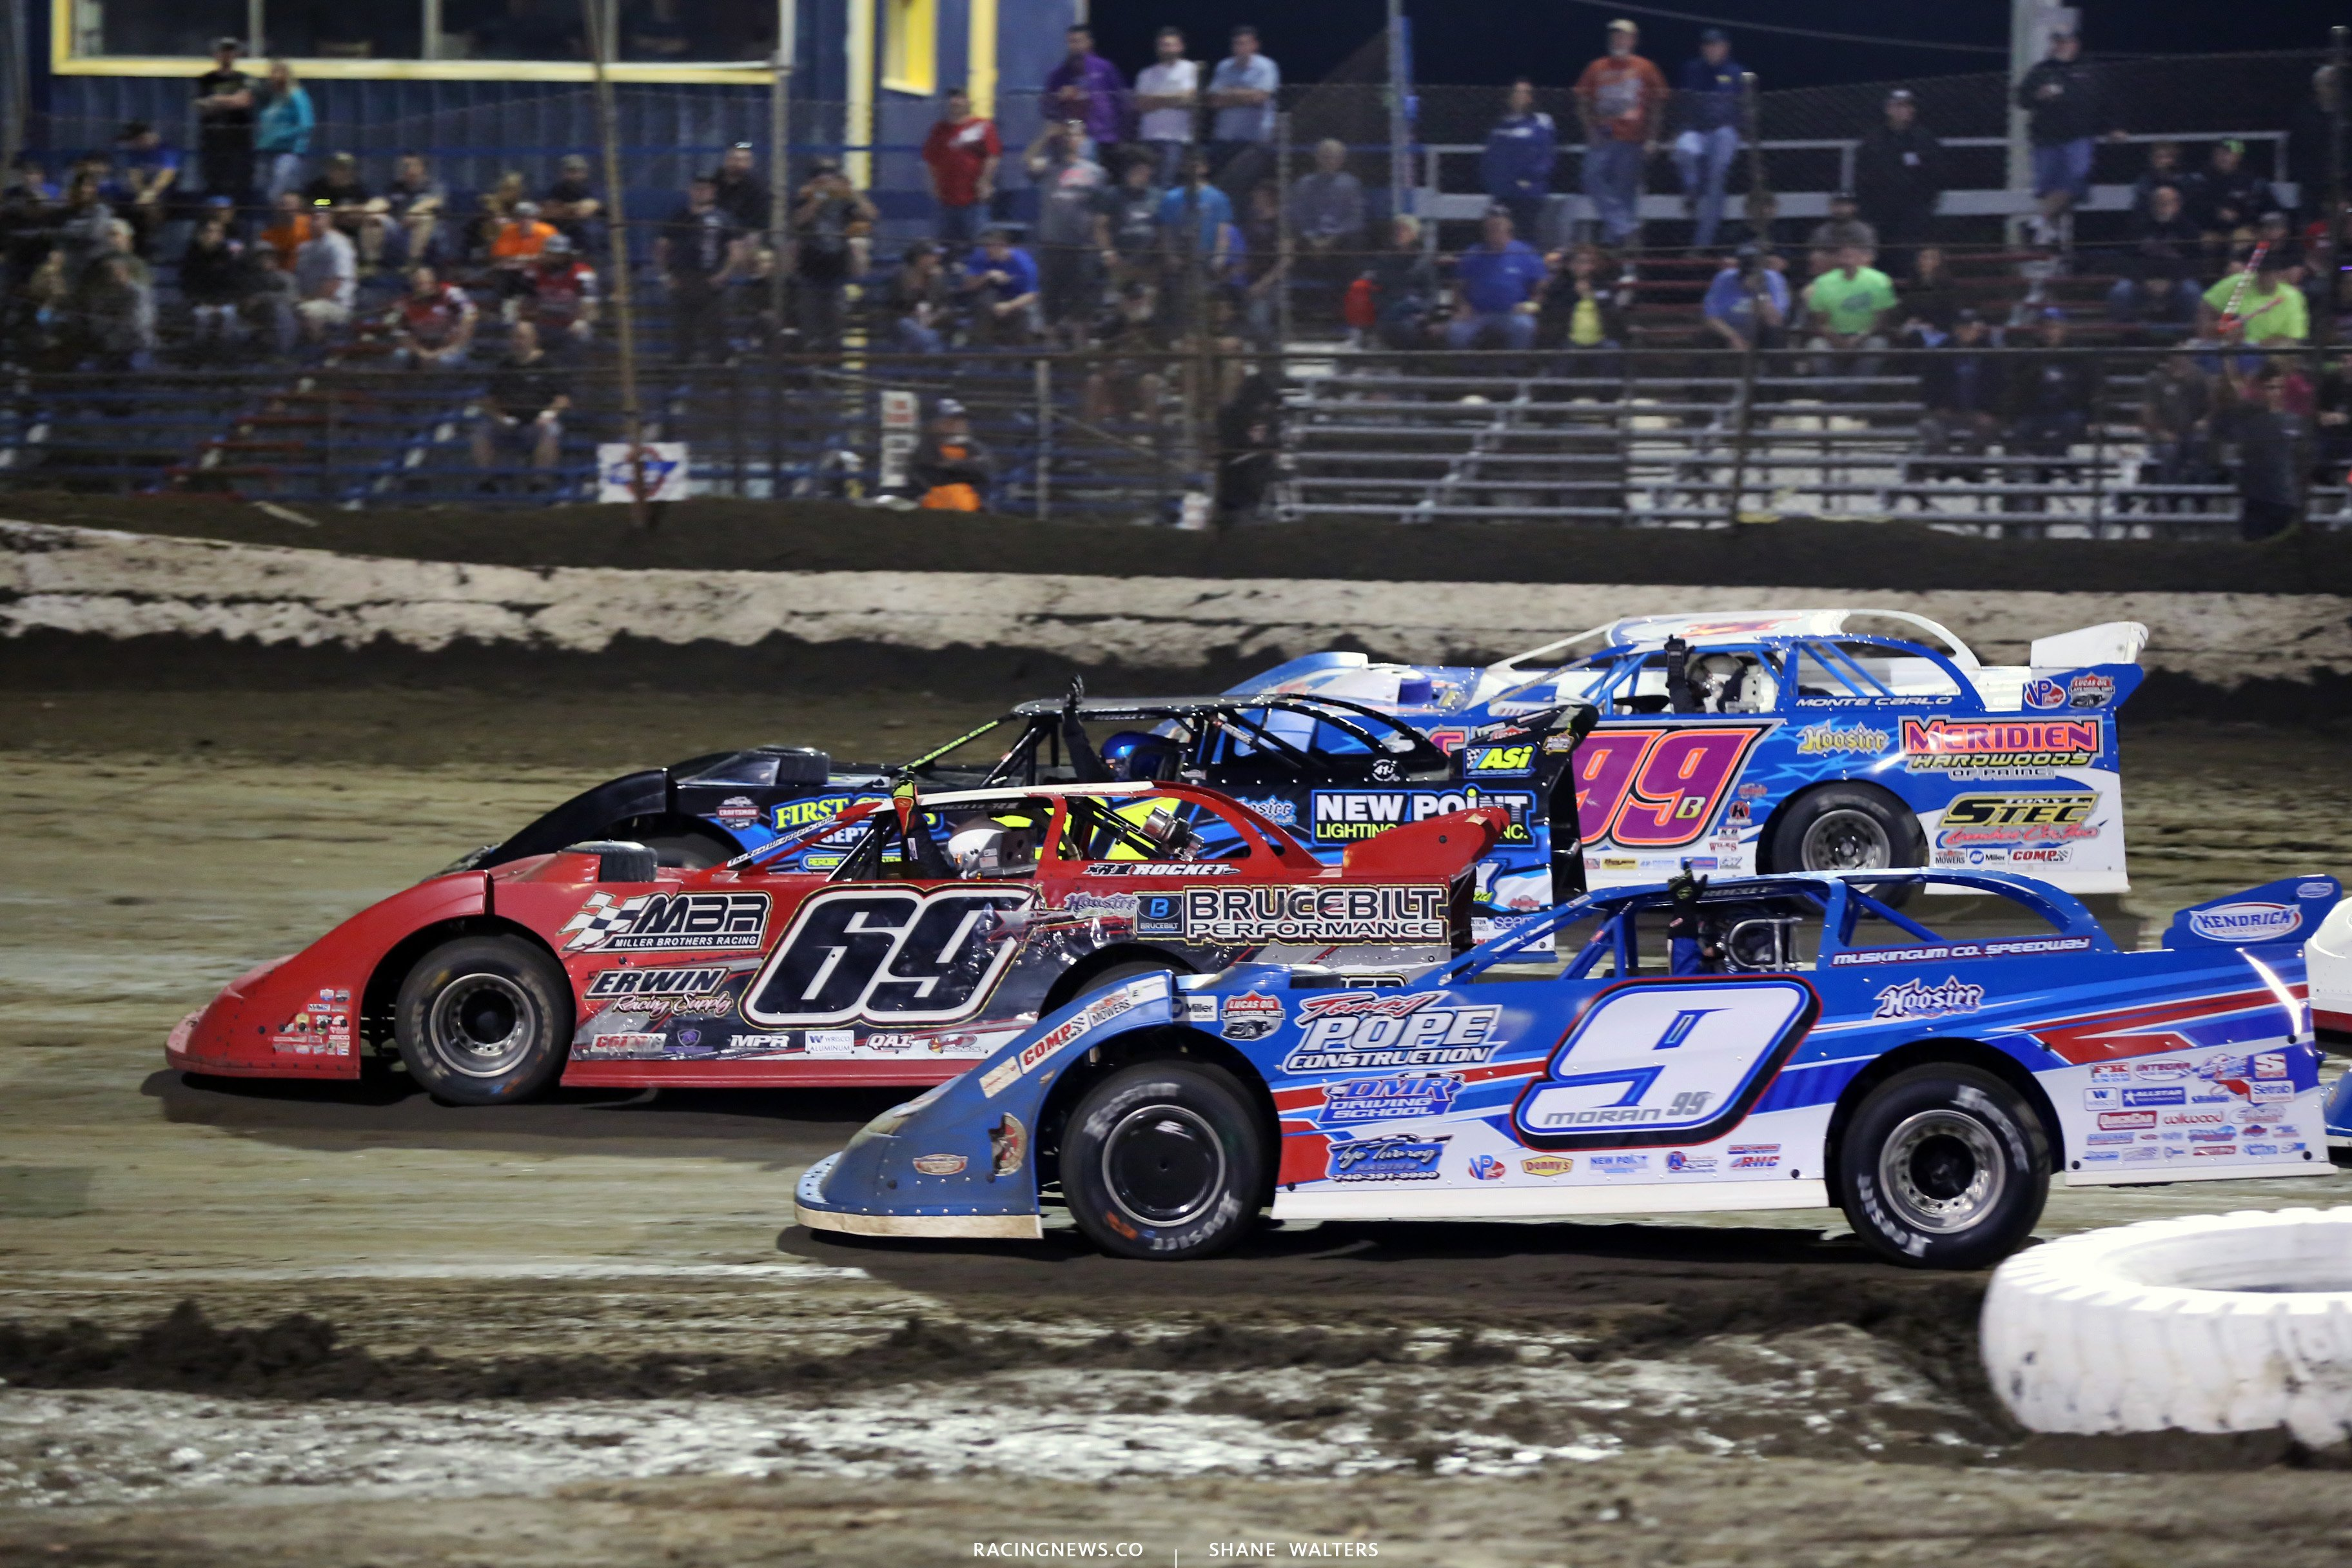 Carder Miller at East Bay Raceway Park - $ wide salute 8211